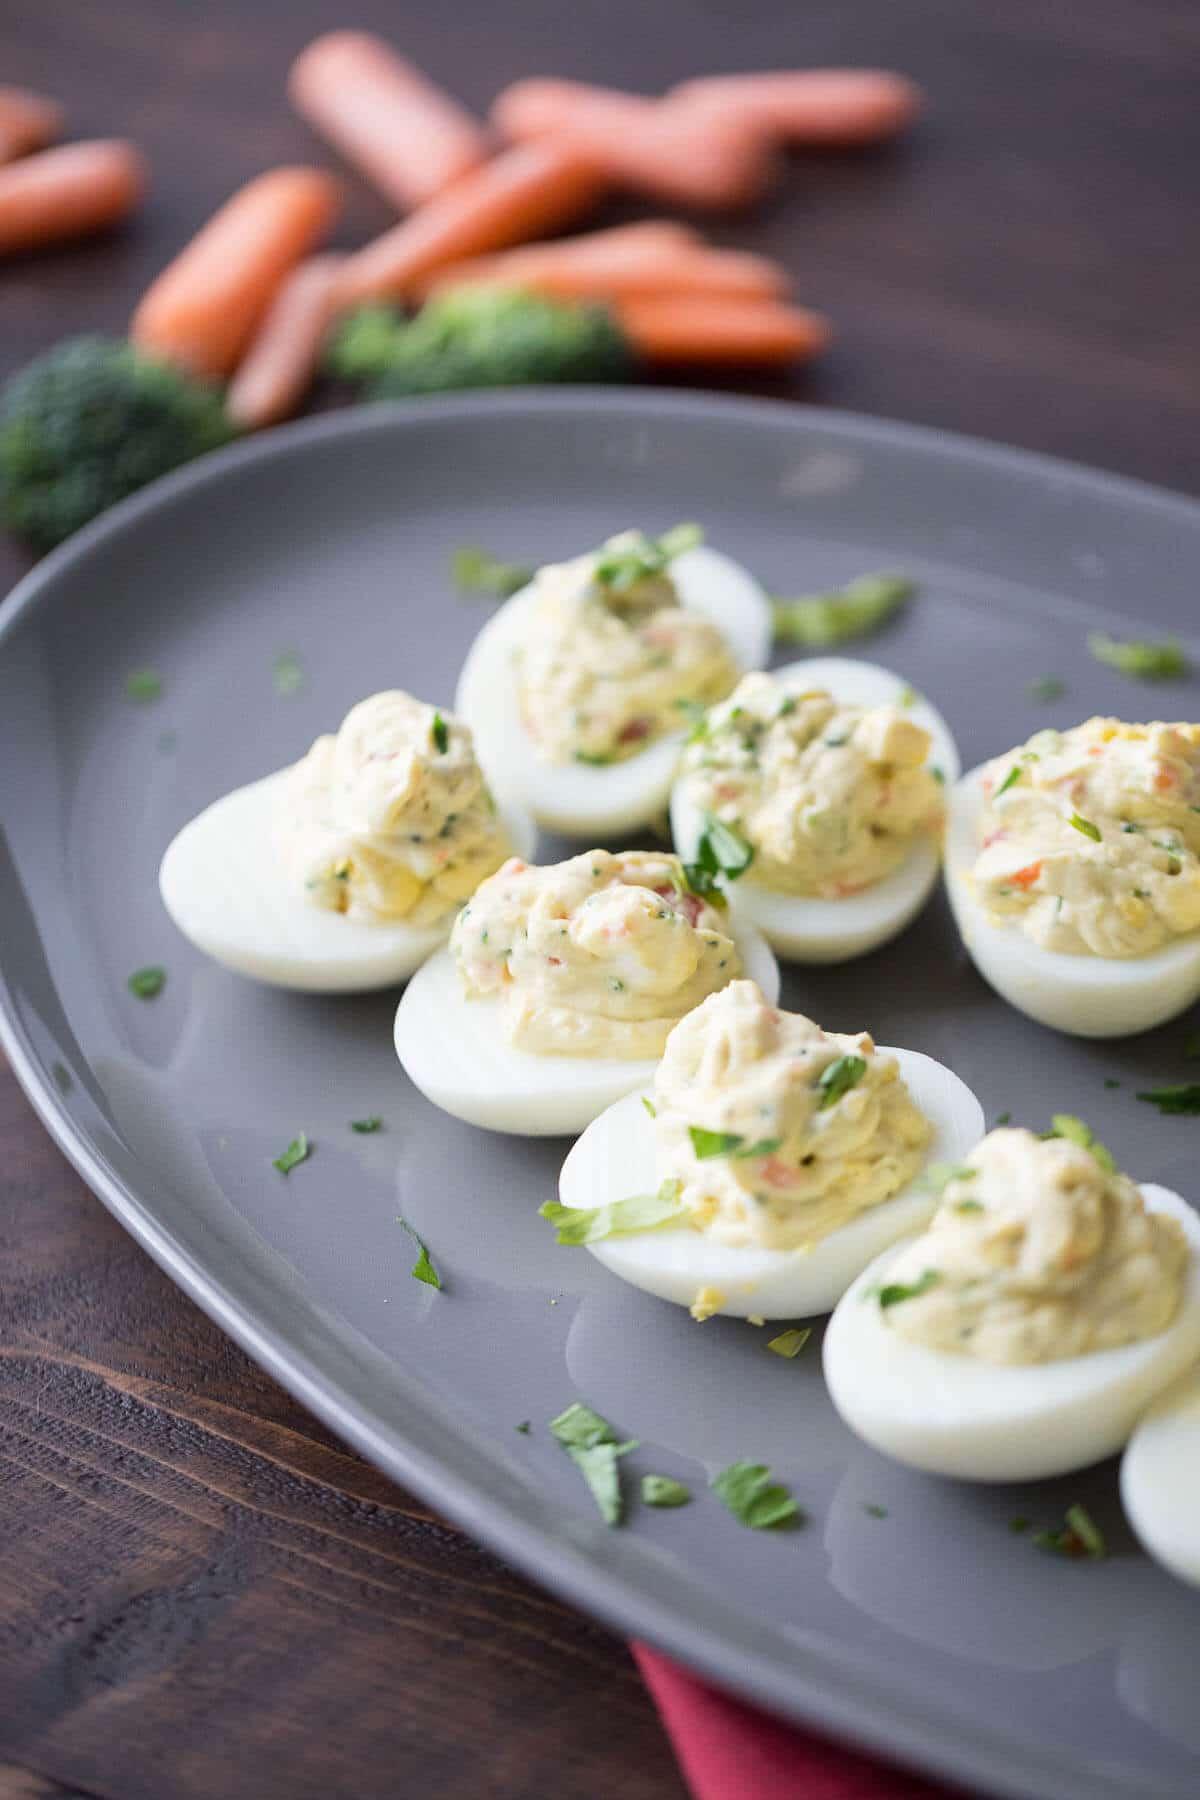 Simple Deviled Eggs with Garden Vegetables  LemonsforLulu.com